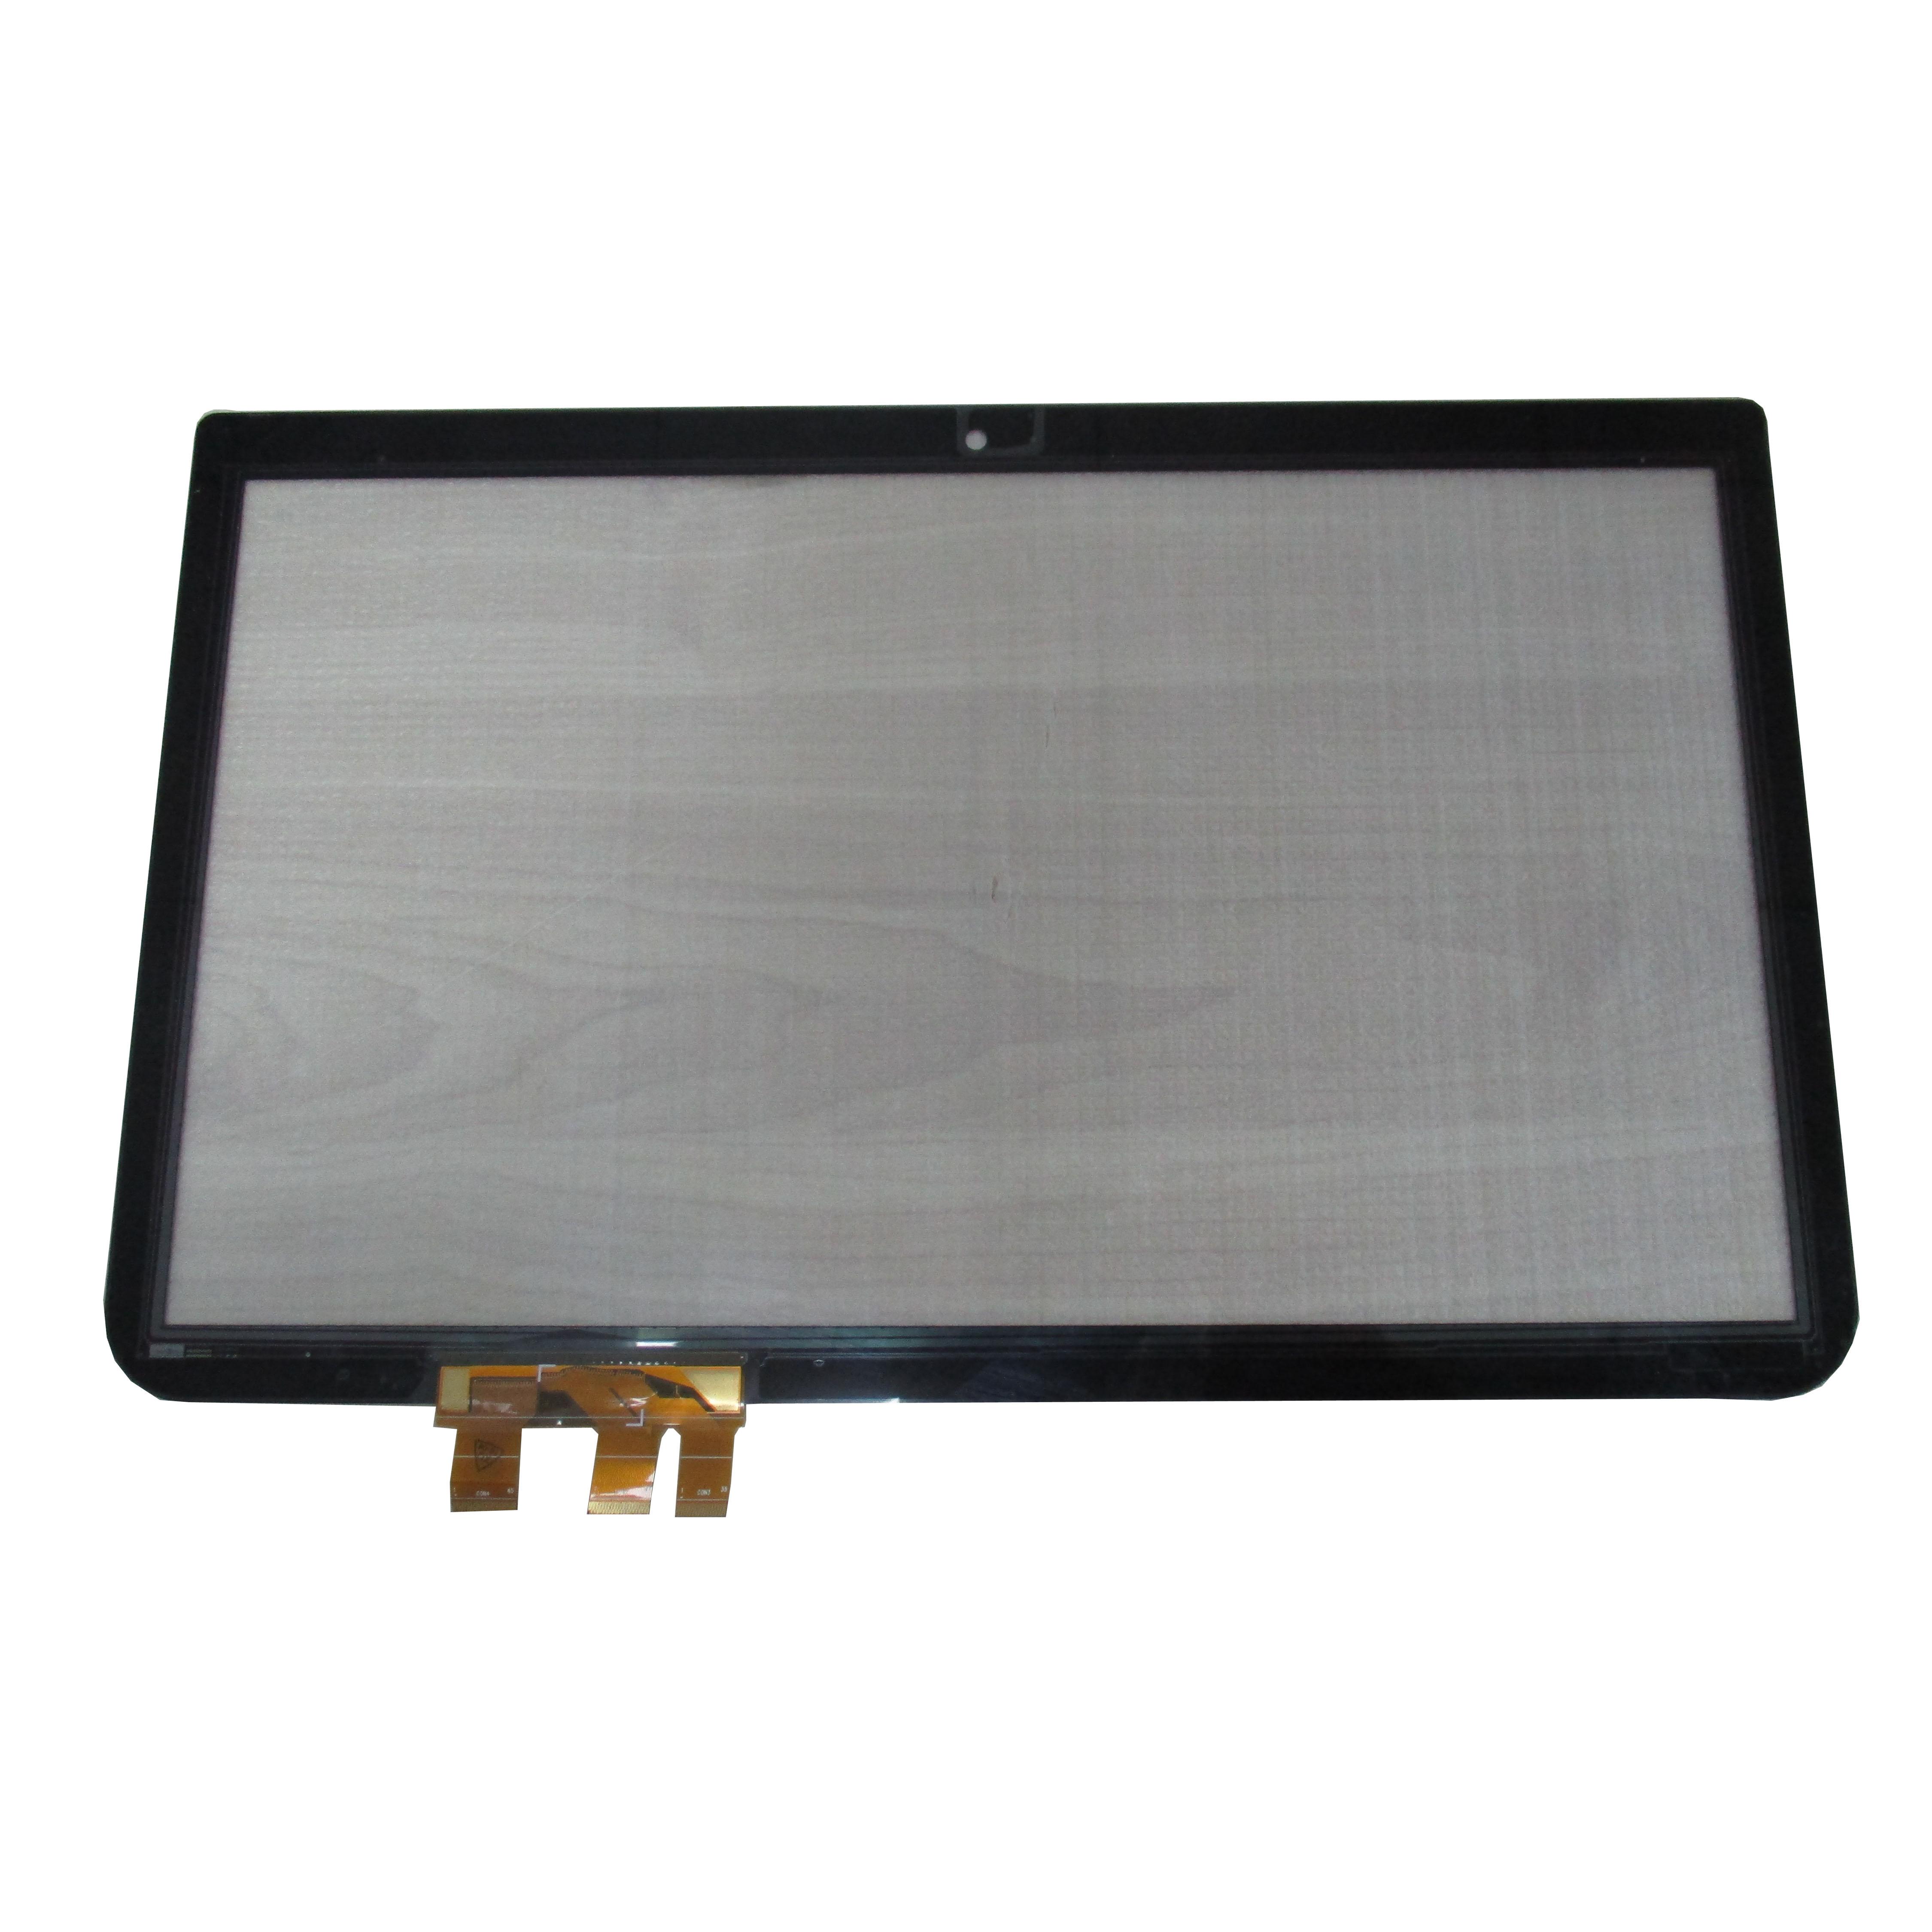 NEW X200 X201 X200S LCD display panel 42T0480 LTD121EQ3B 90 days warranty